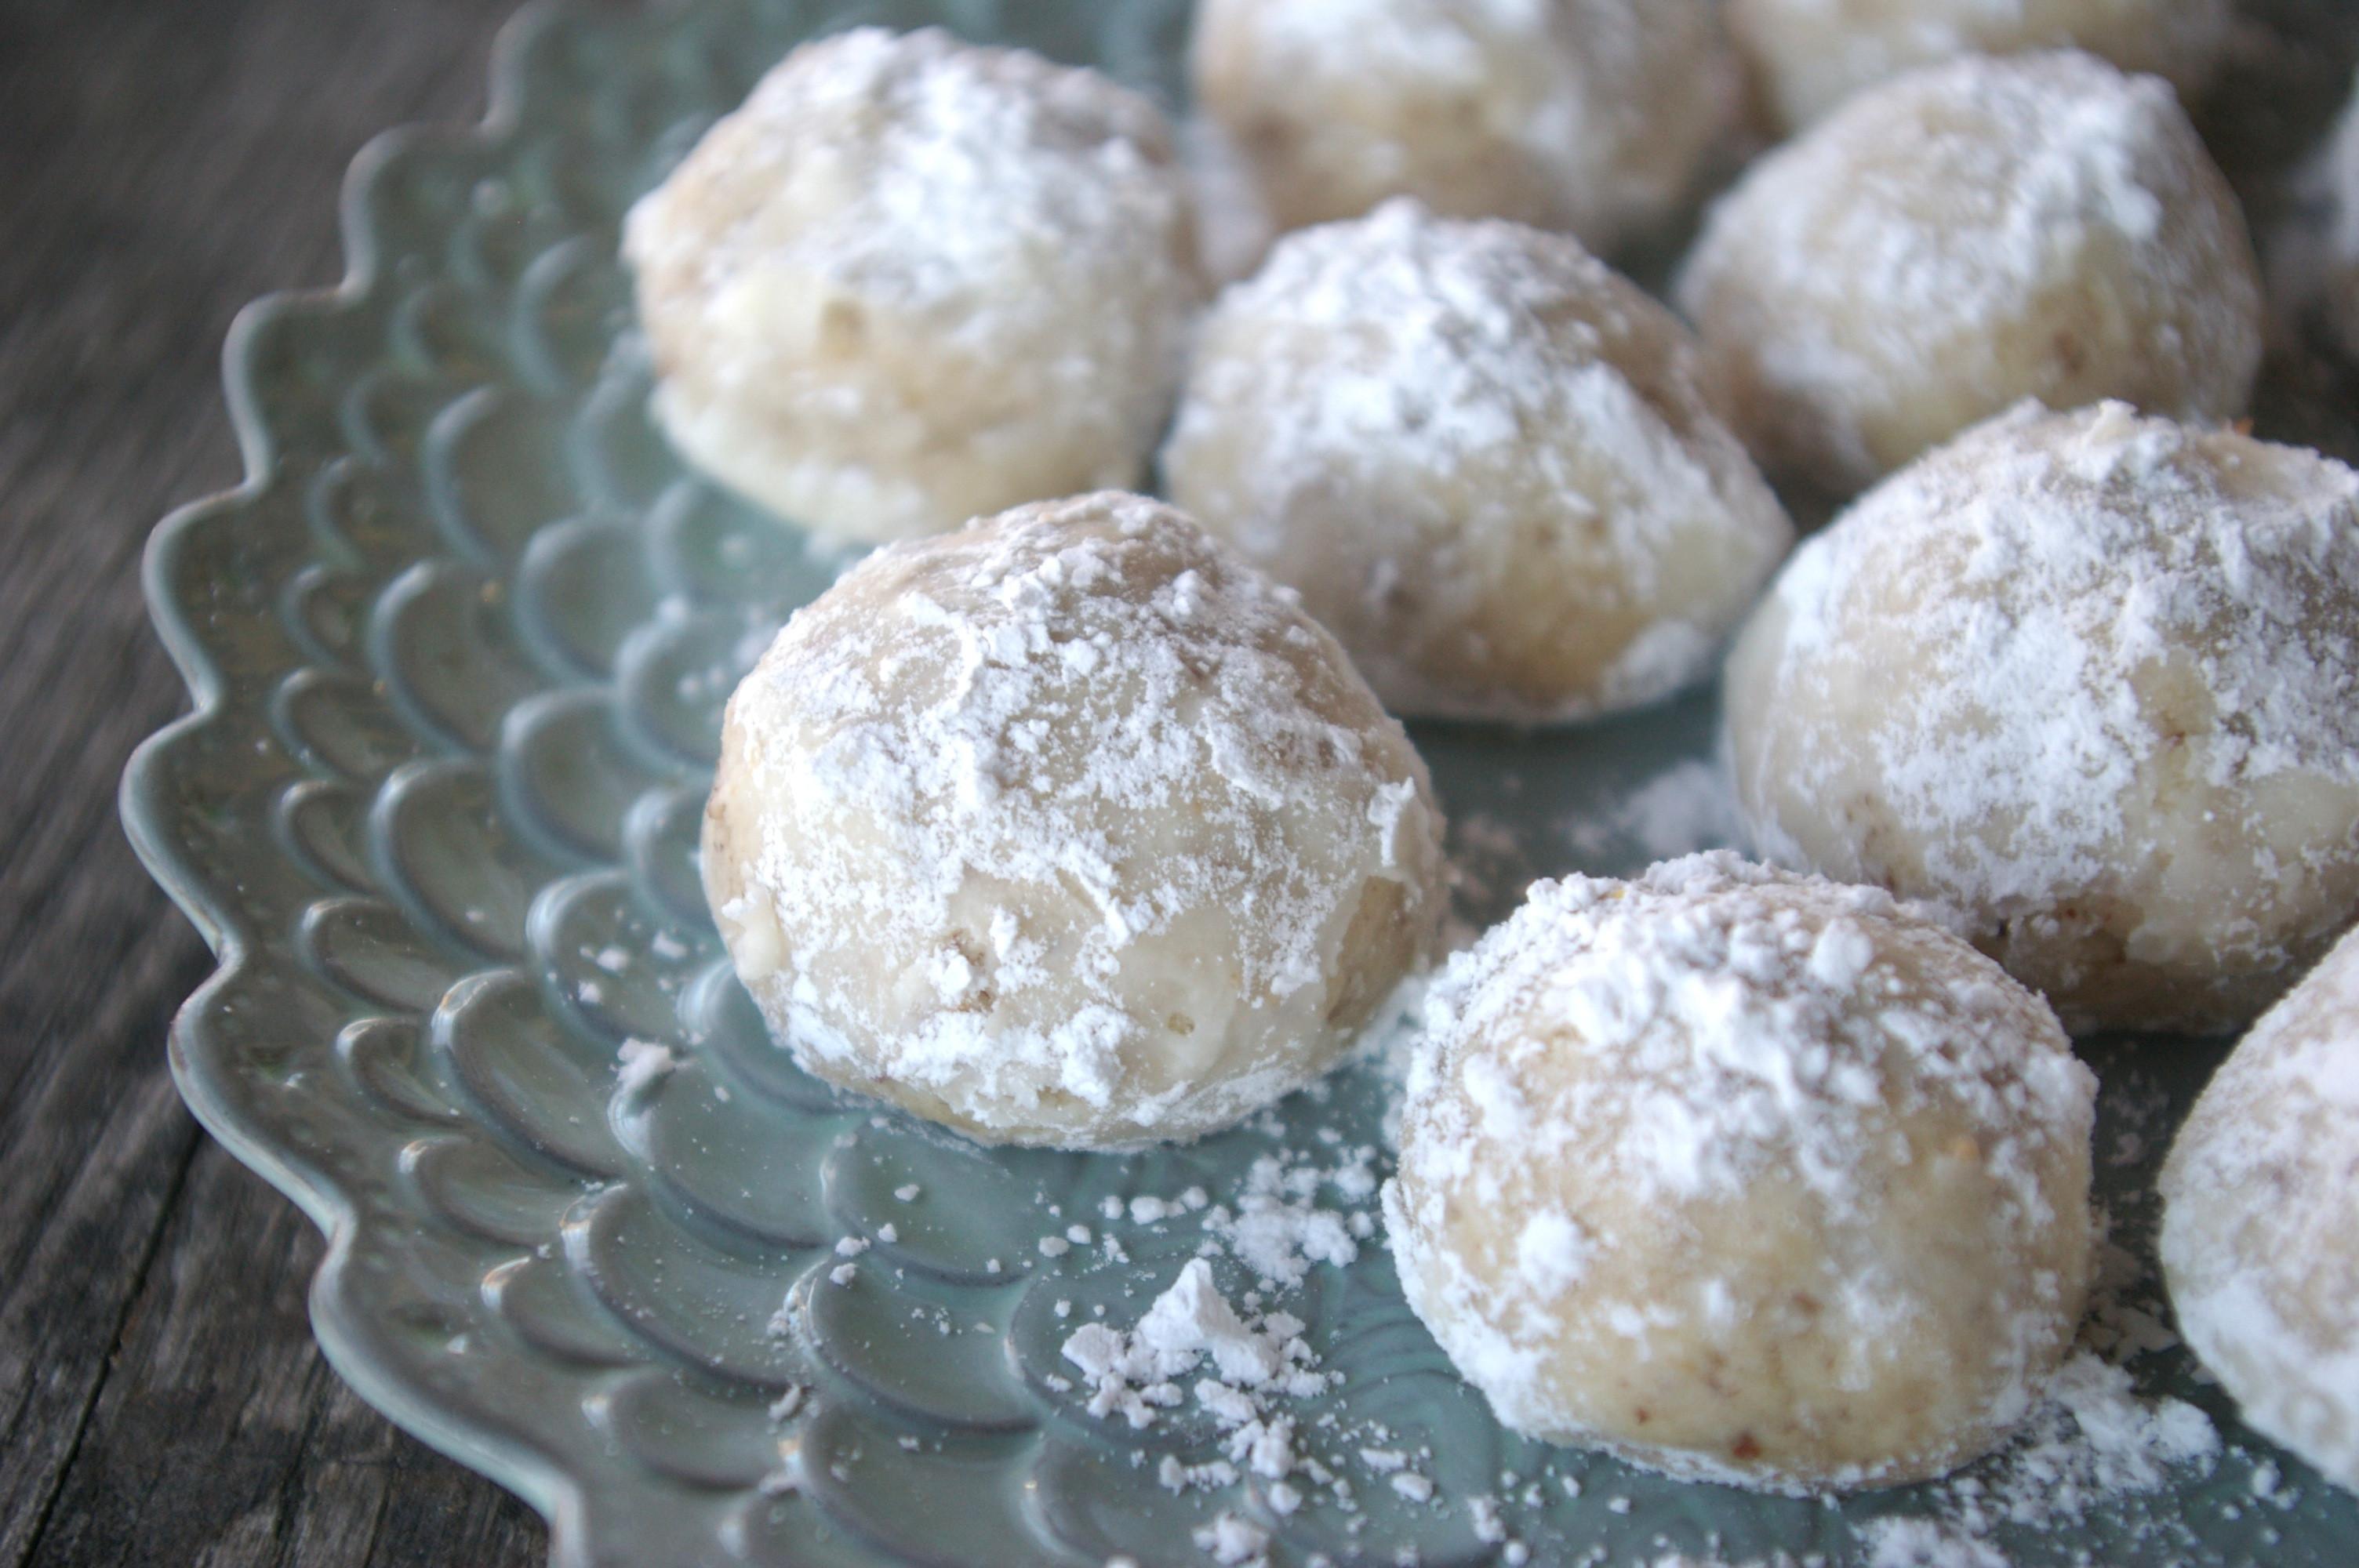 Betty Crocker Mexican Wedding Cakes  Mexican Wedding Cakes Recipes — Dishmaps